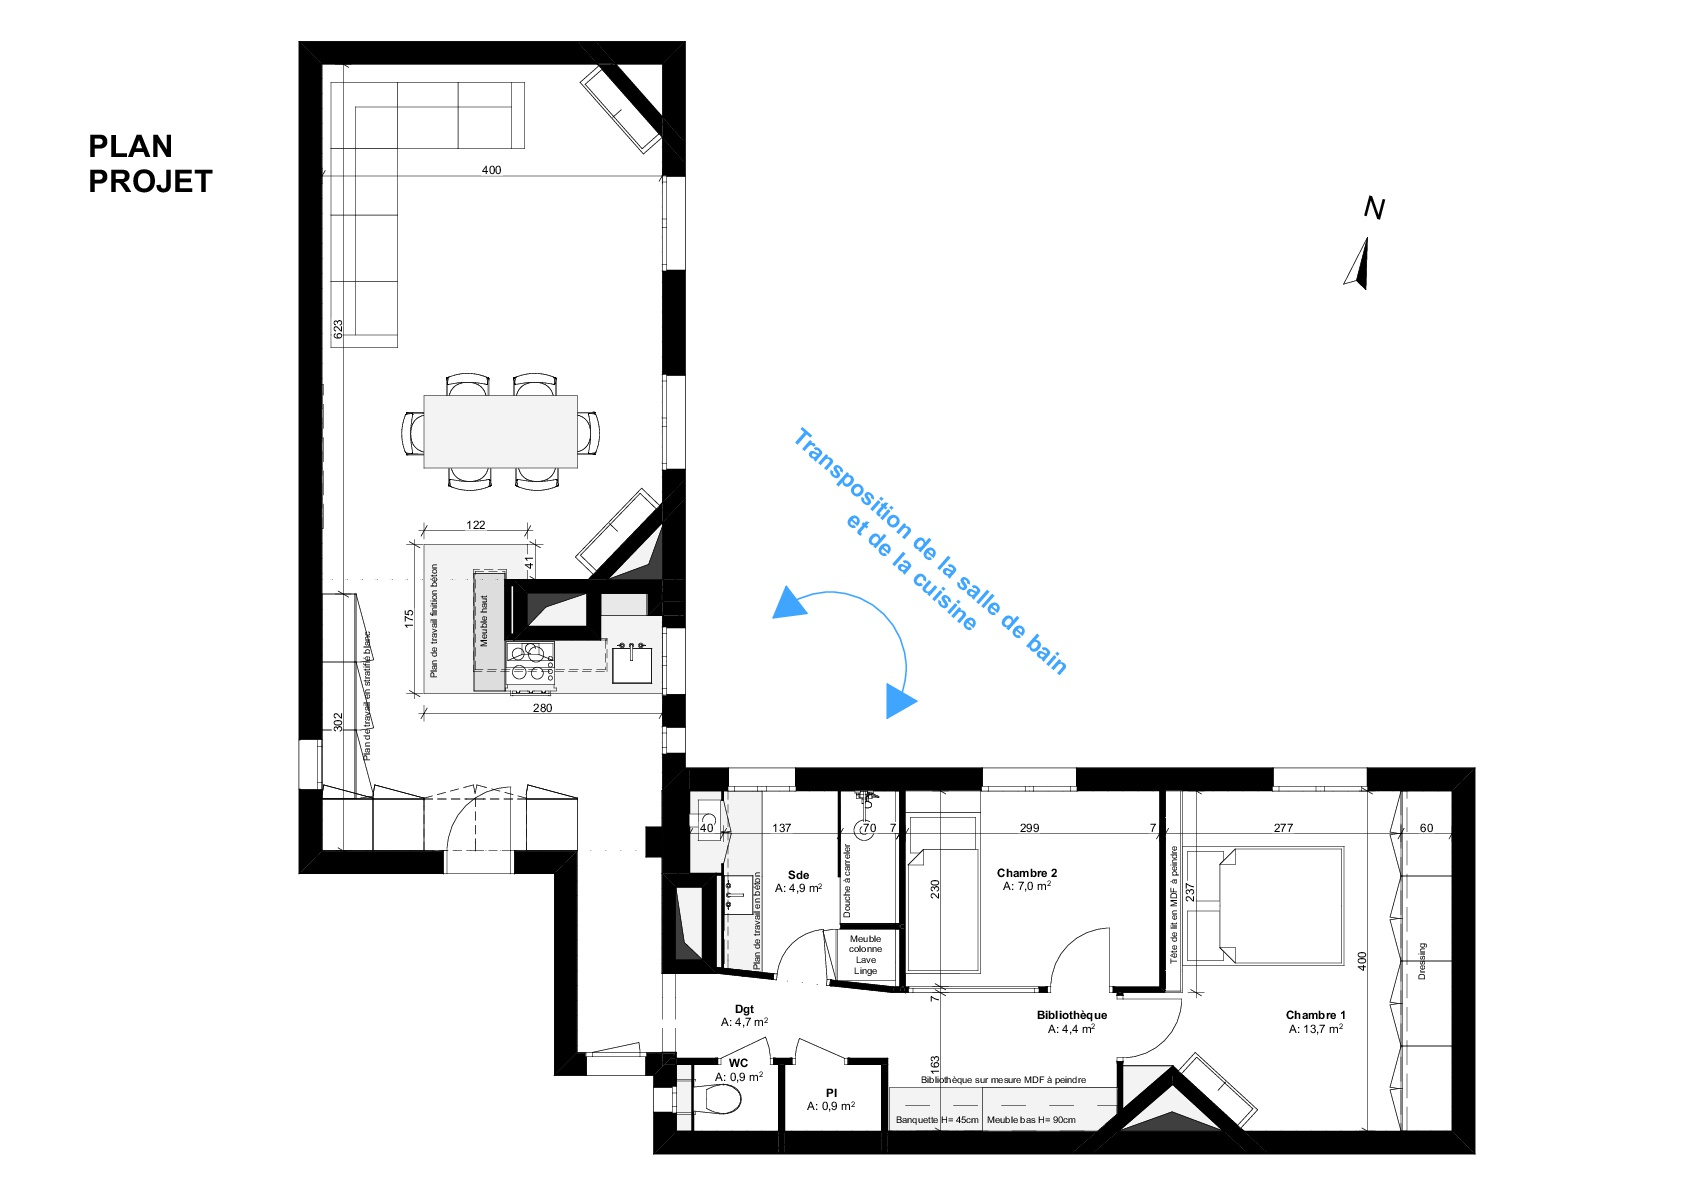 KED04 Plan projet-001